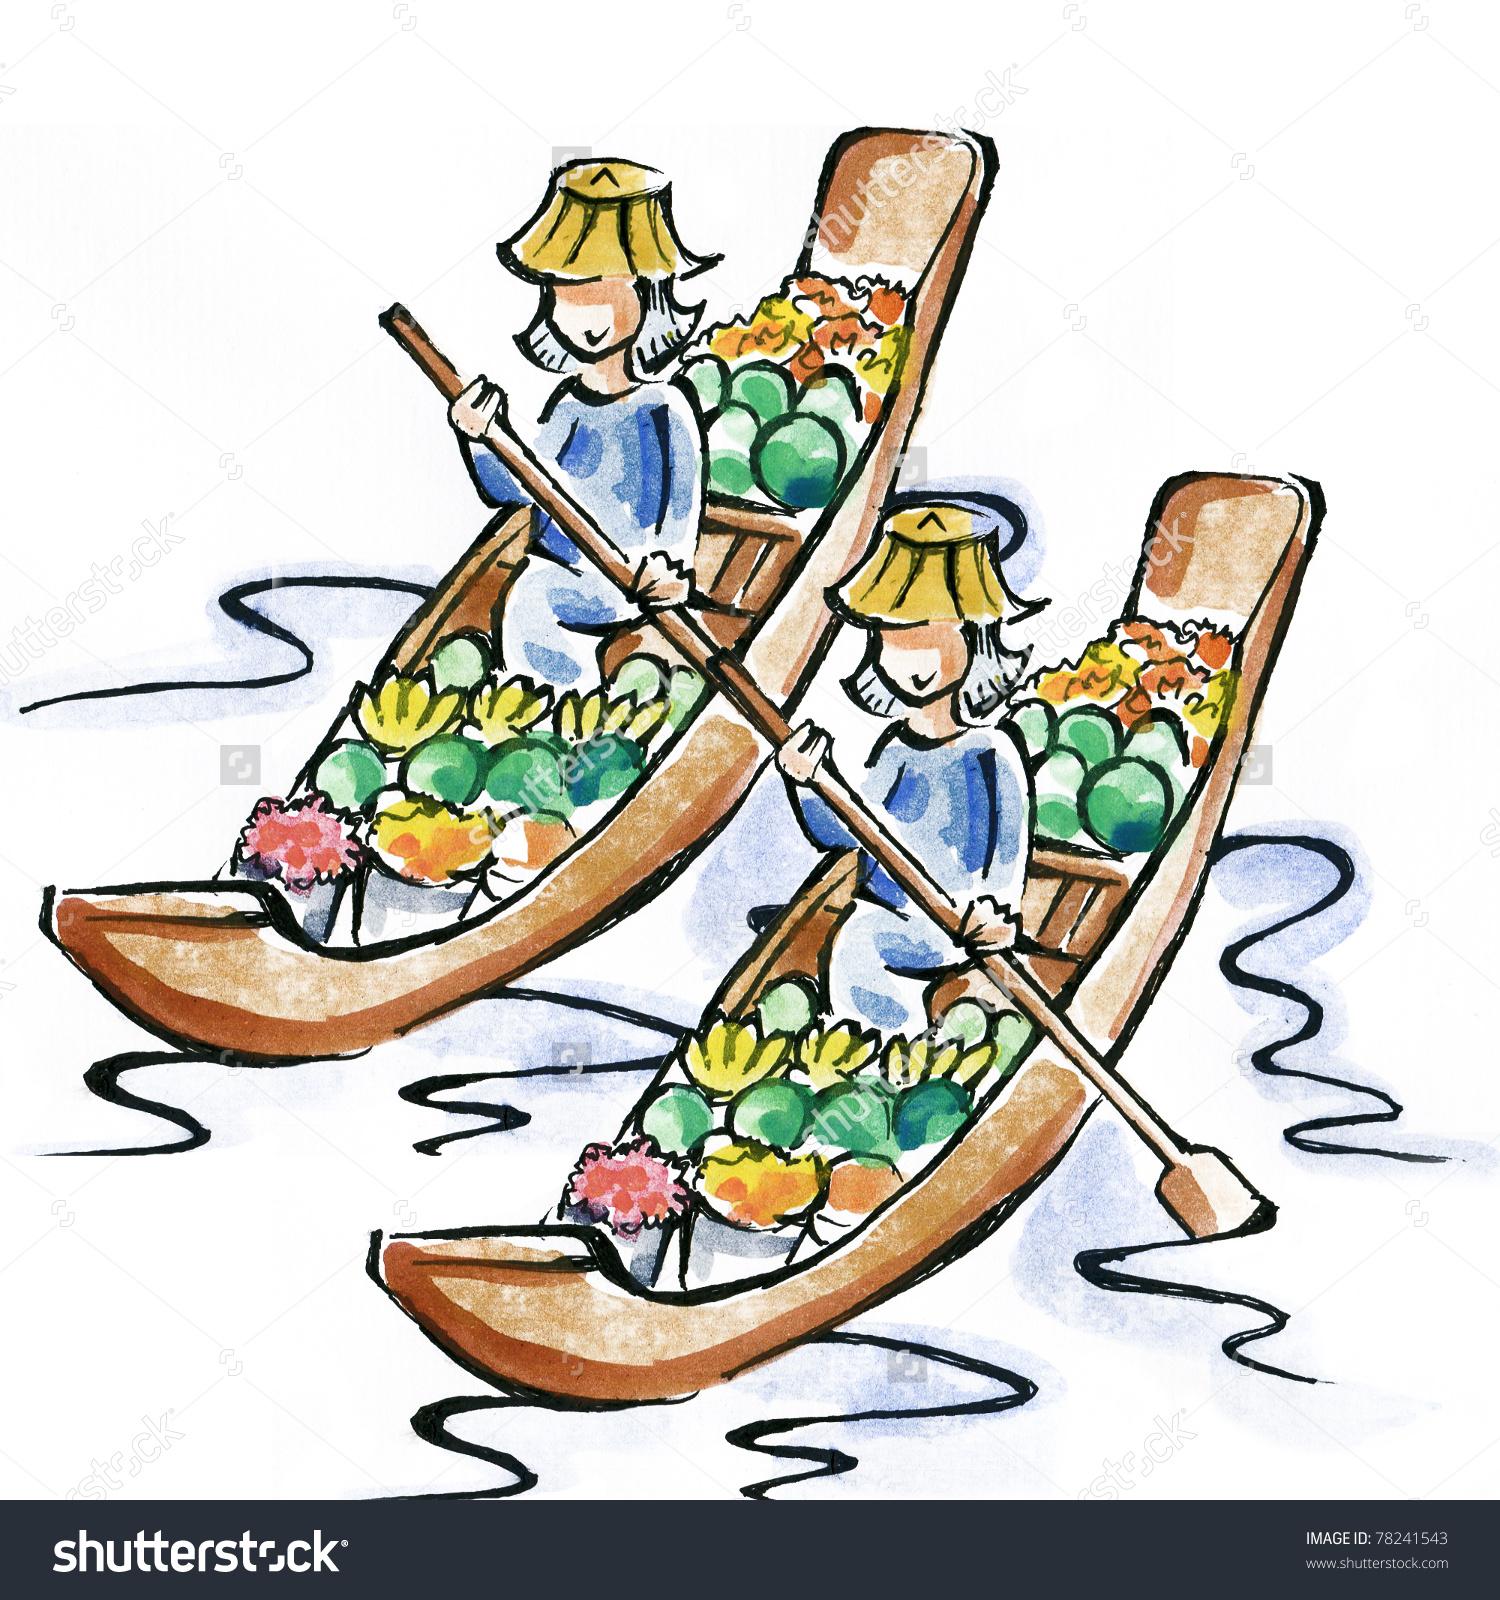 Floating Market Stock Illustration 78241543.